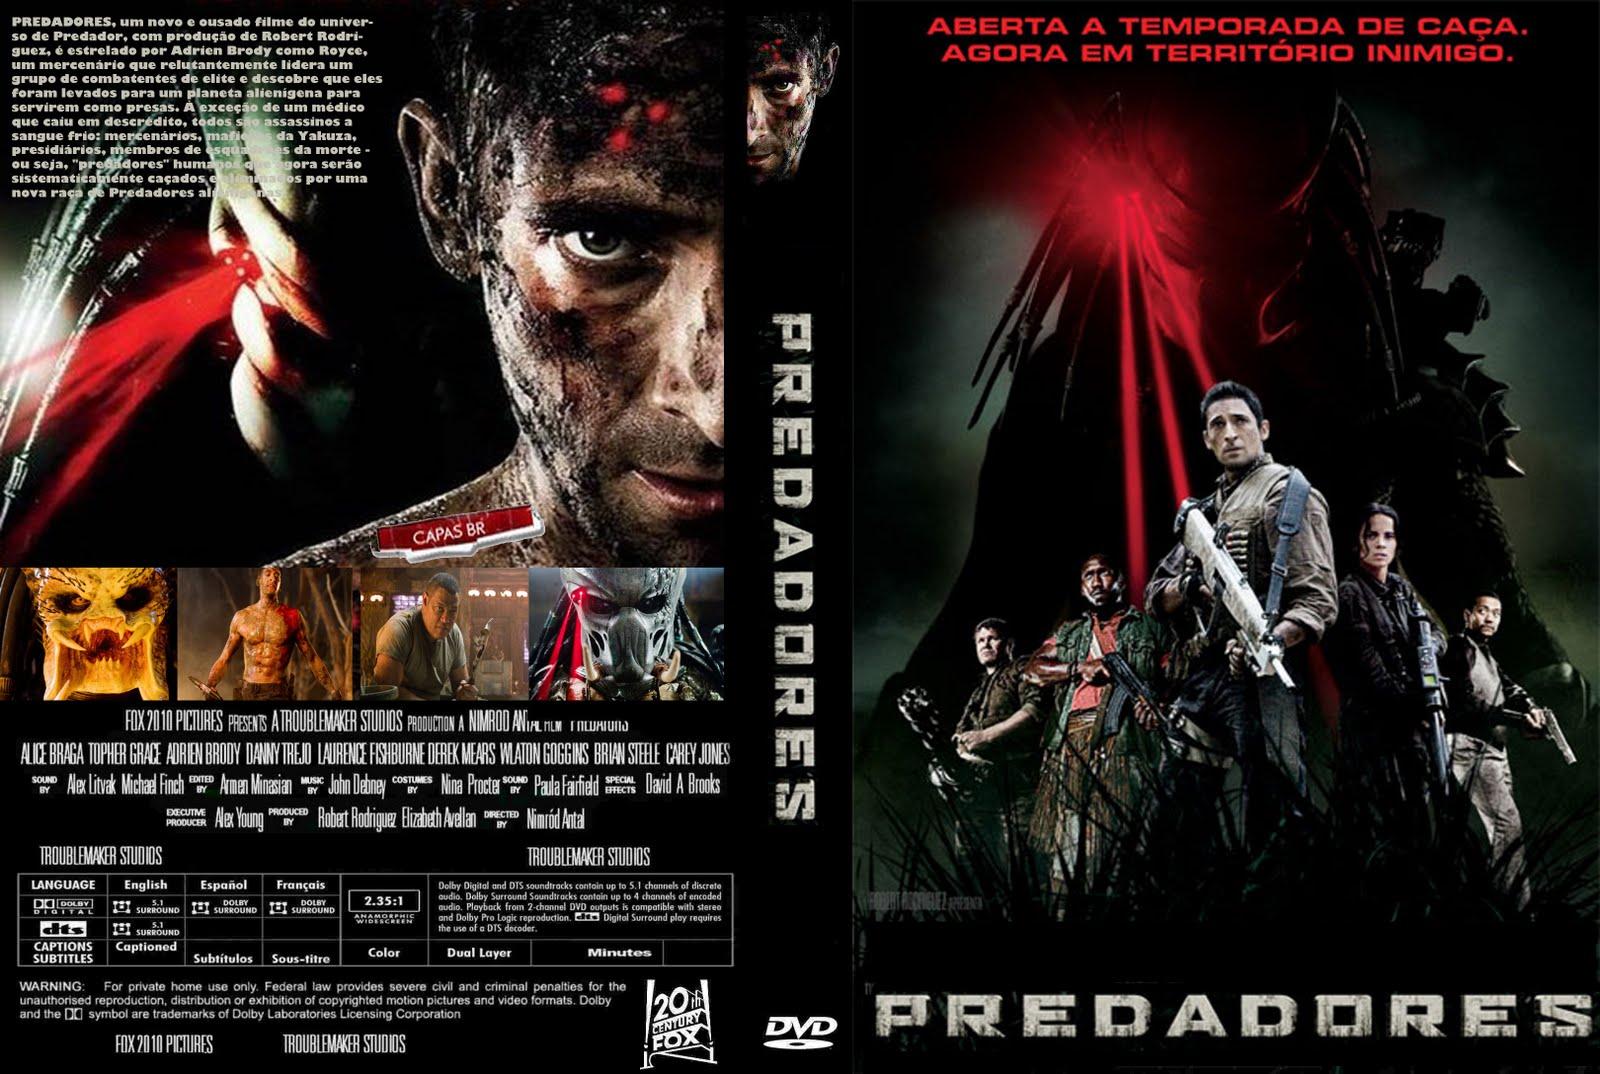 http://3.bp.blogspot.com/_pnOdTUC4iSY/TESgCciHlPI/AAAAAAAAARc/gckC84vPDbk/s1600/Predadores+-+2010.jpg